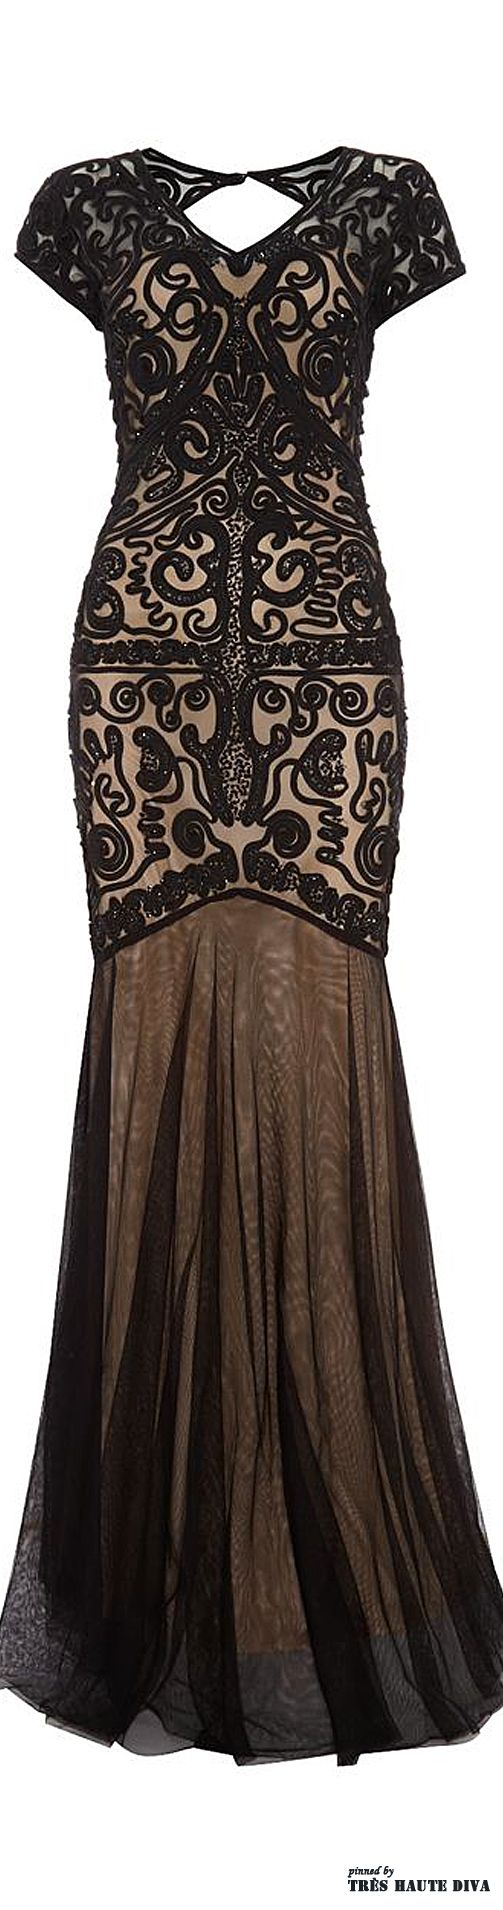 Black cornelli embroidered evening dress